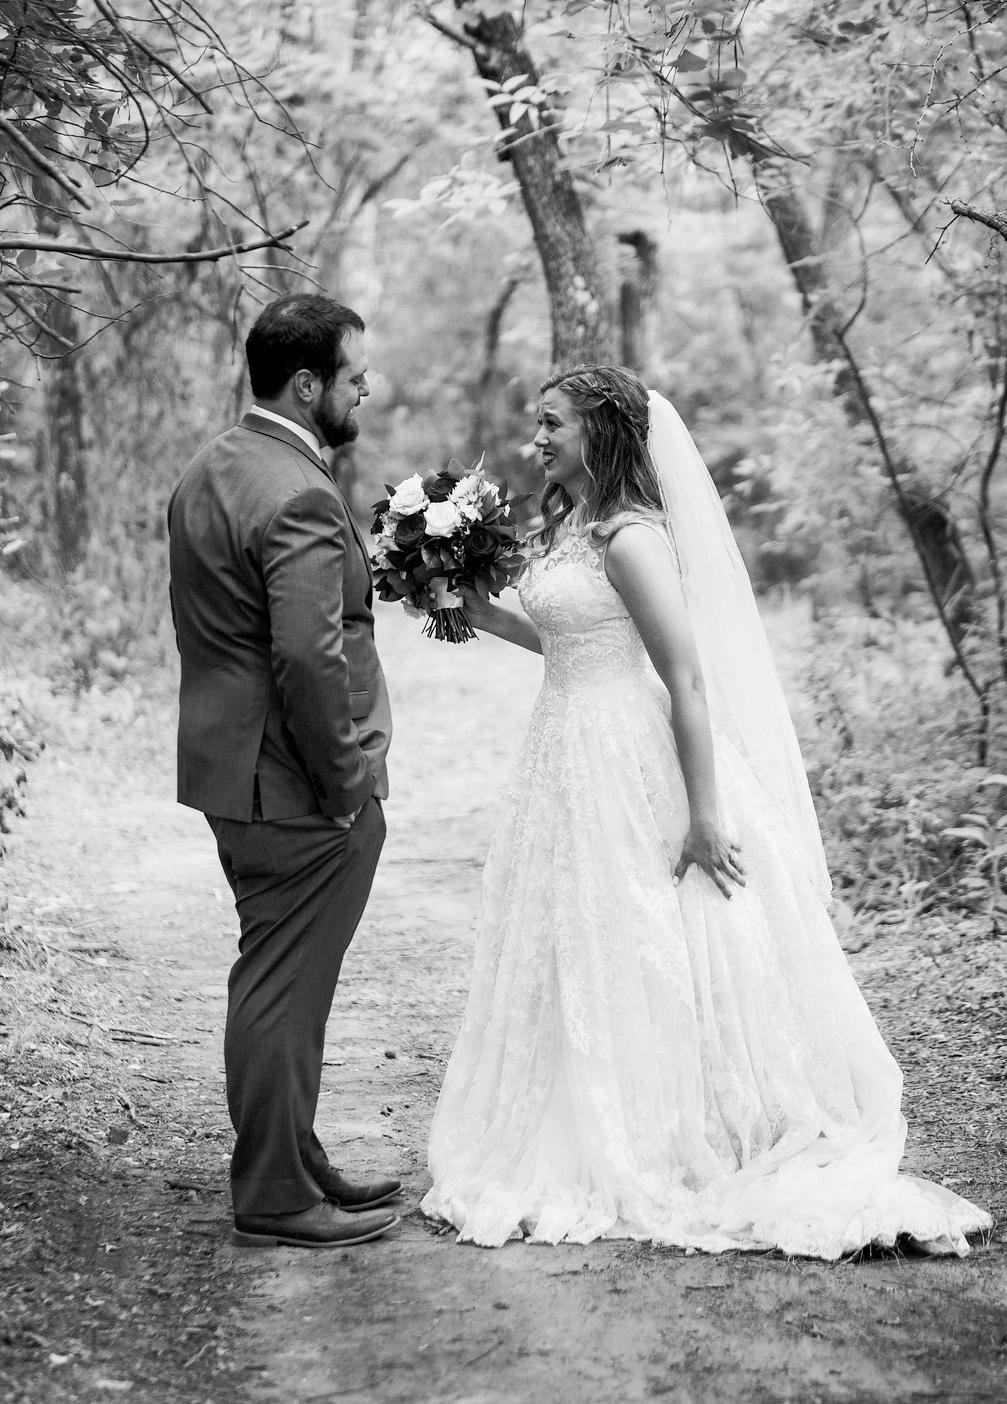 Lexi-Colby-Wedding-2620.jpg